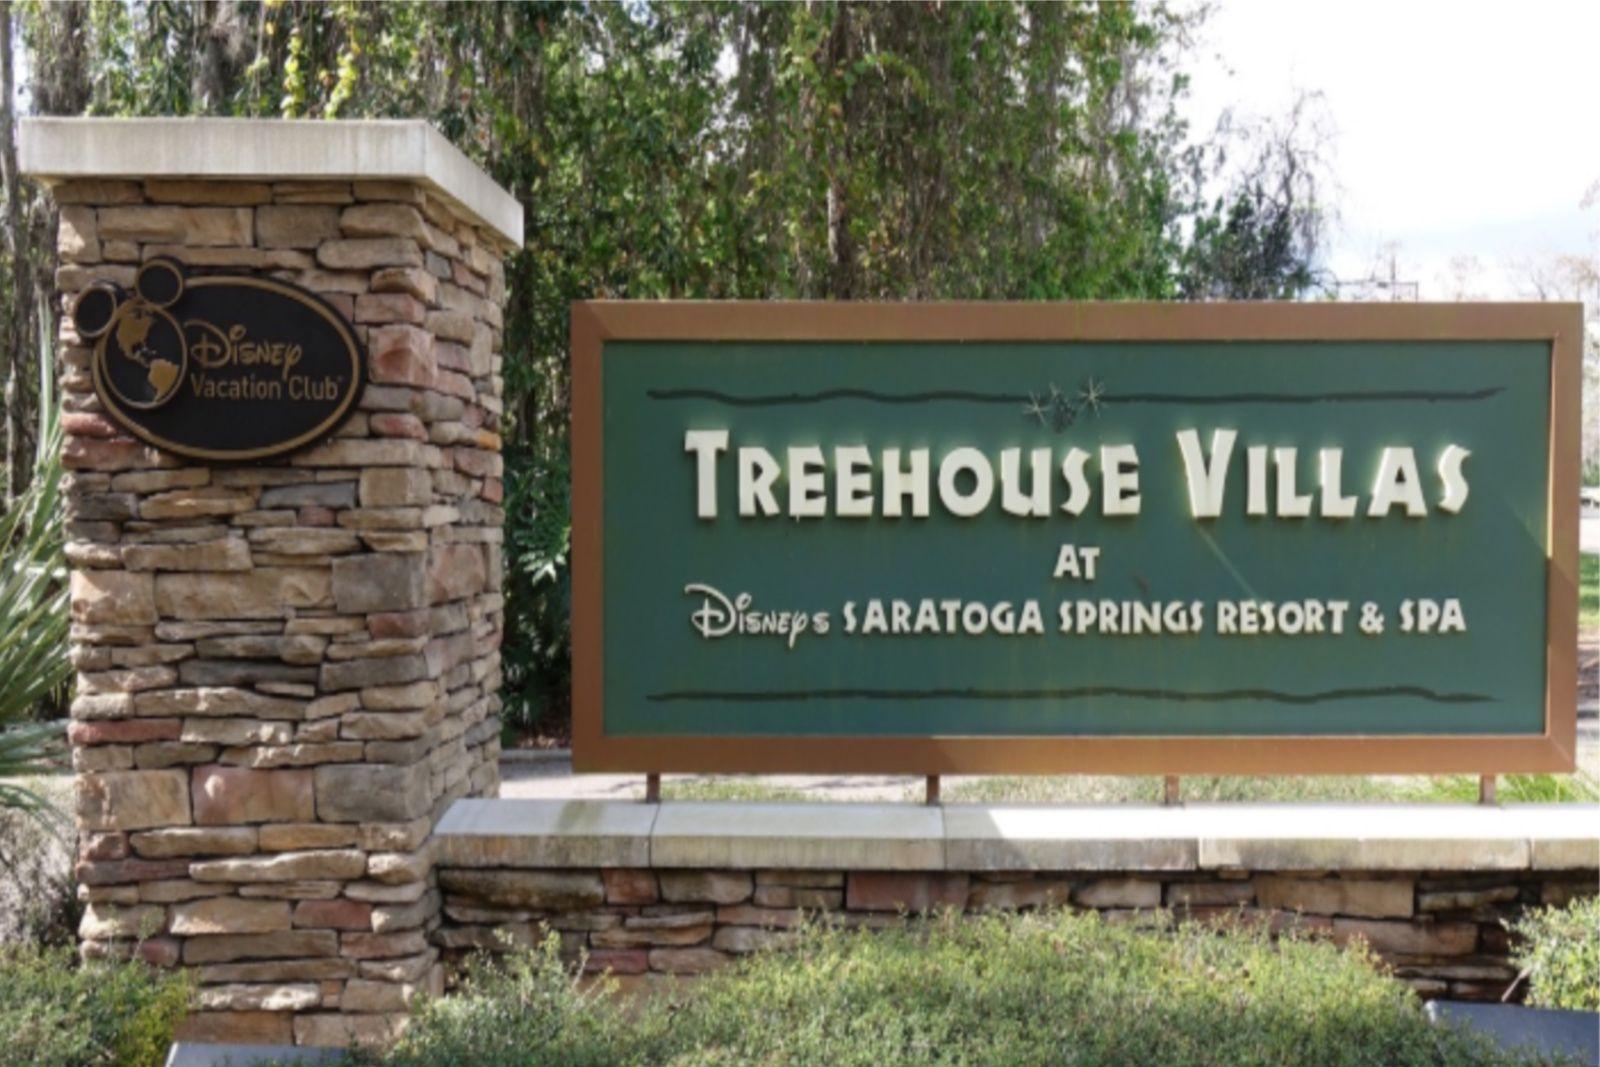 Treehouse Villas Tour at Disney's Saratoga Springs Resort